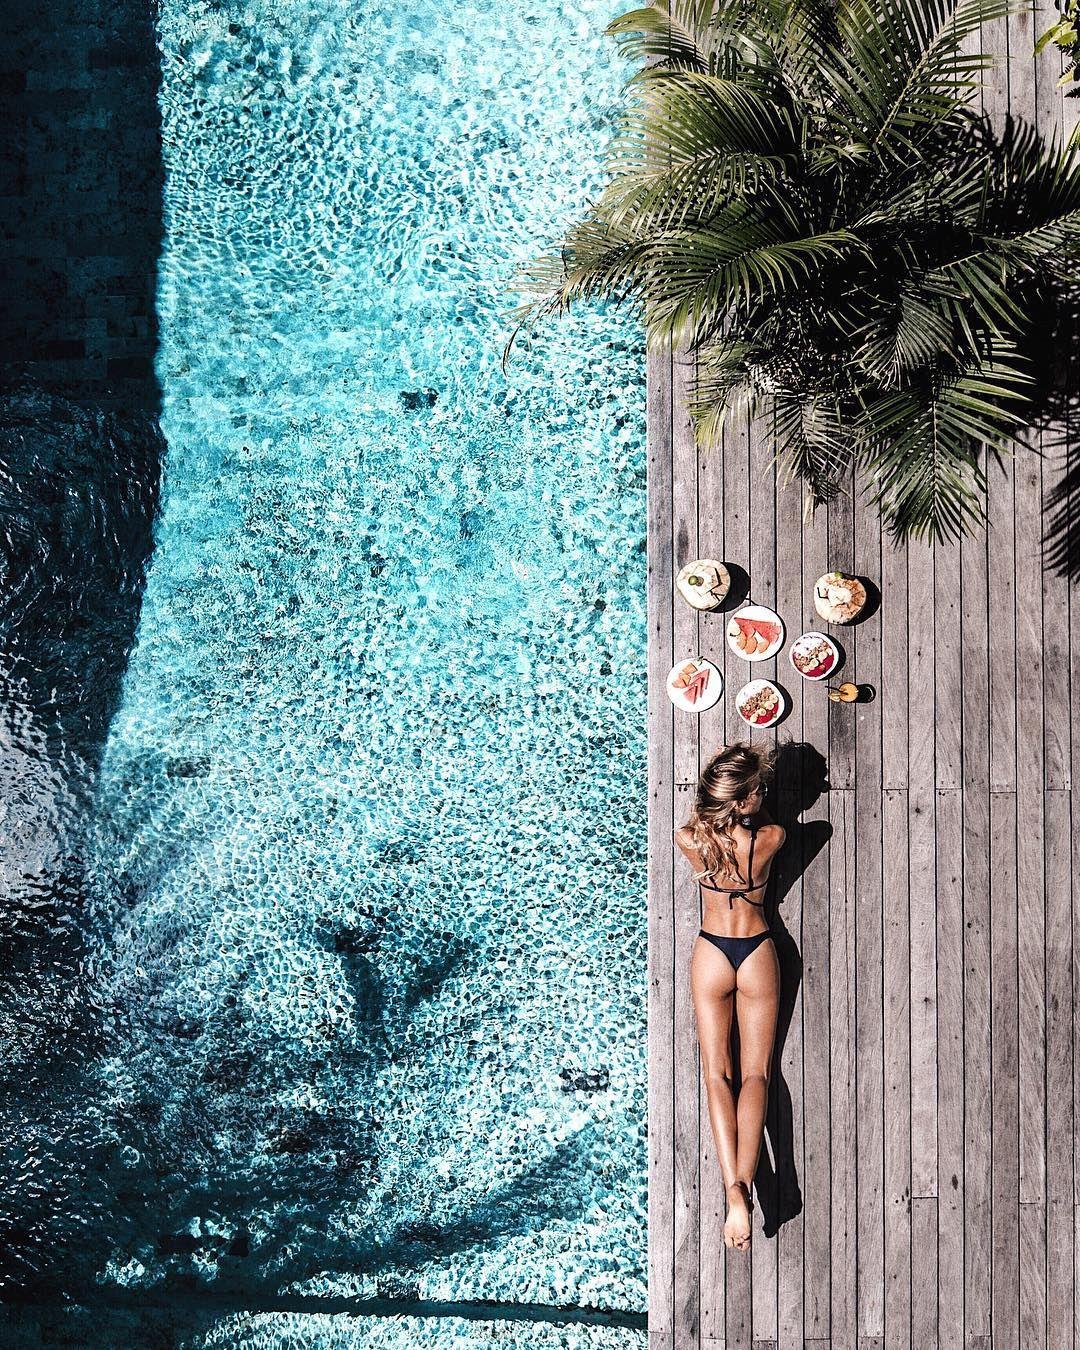 laufair • pinterest laurafairhurst_ • insta  Summer Times | #MichaelLouis - www.MichaelLouis.com